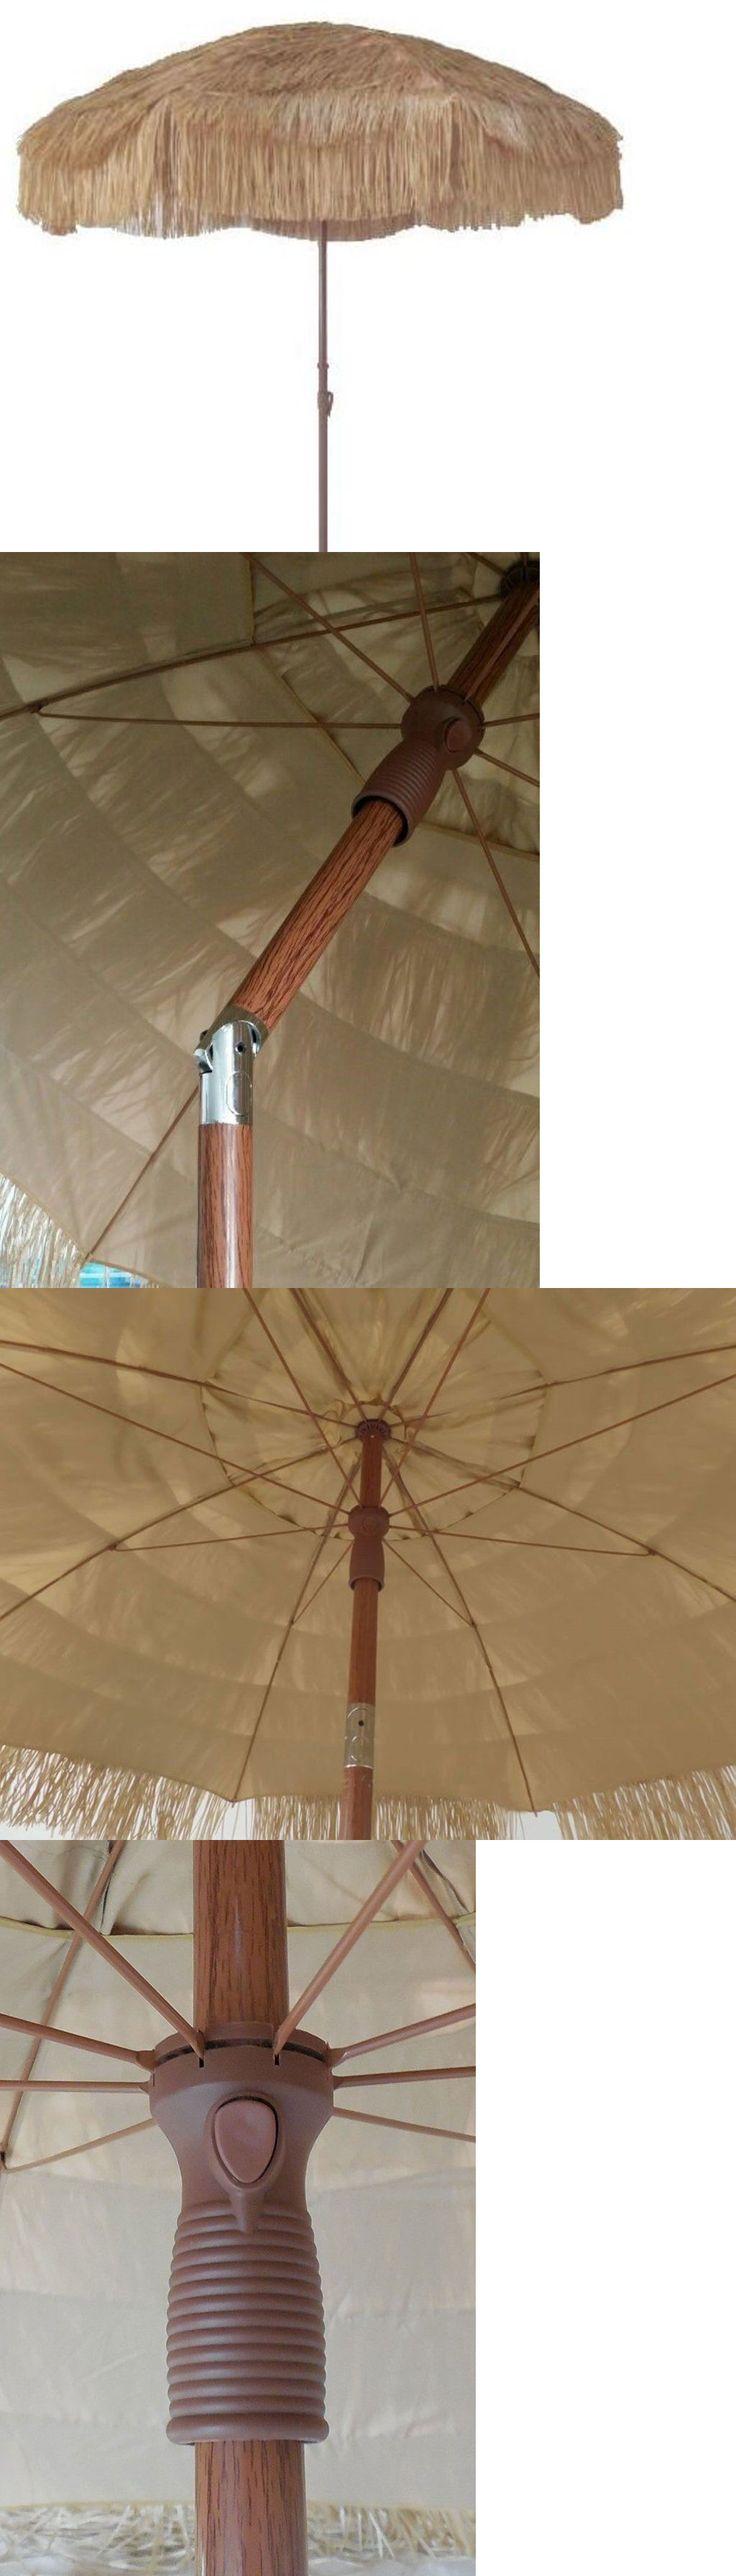 Umbrellas 180998: 8 Hula Beach Patio Umbrella Hawaiin Thatched Tiki Umbrella Impact Canopy -> BUY IT NOW ONLY: $52.99 on eBay!